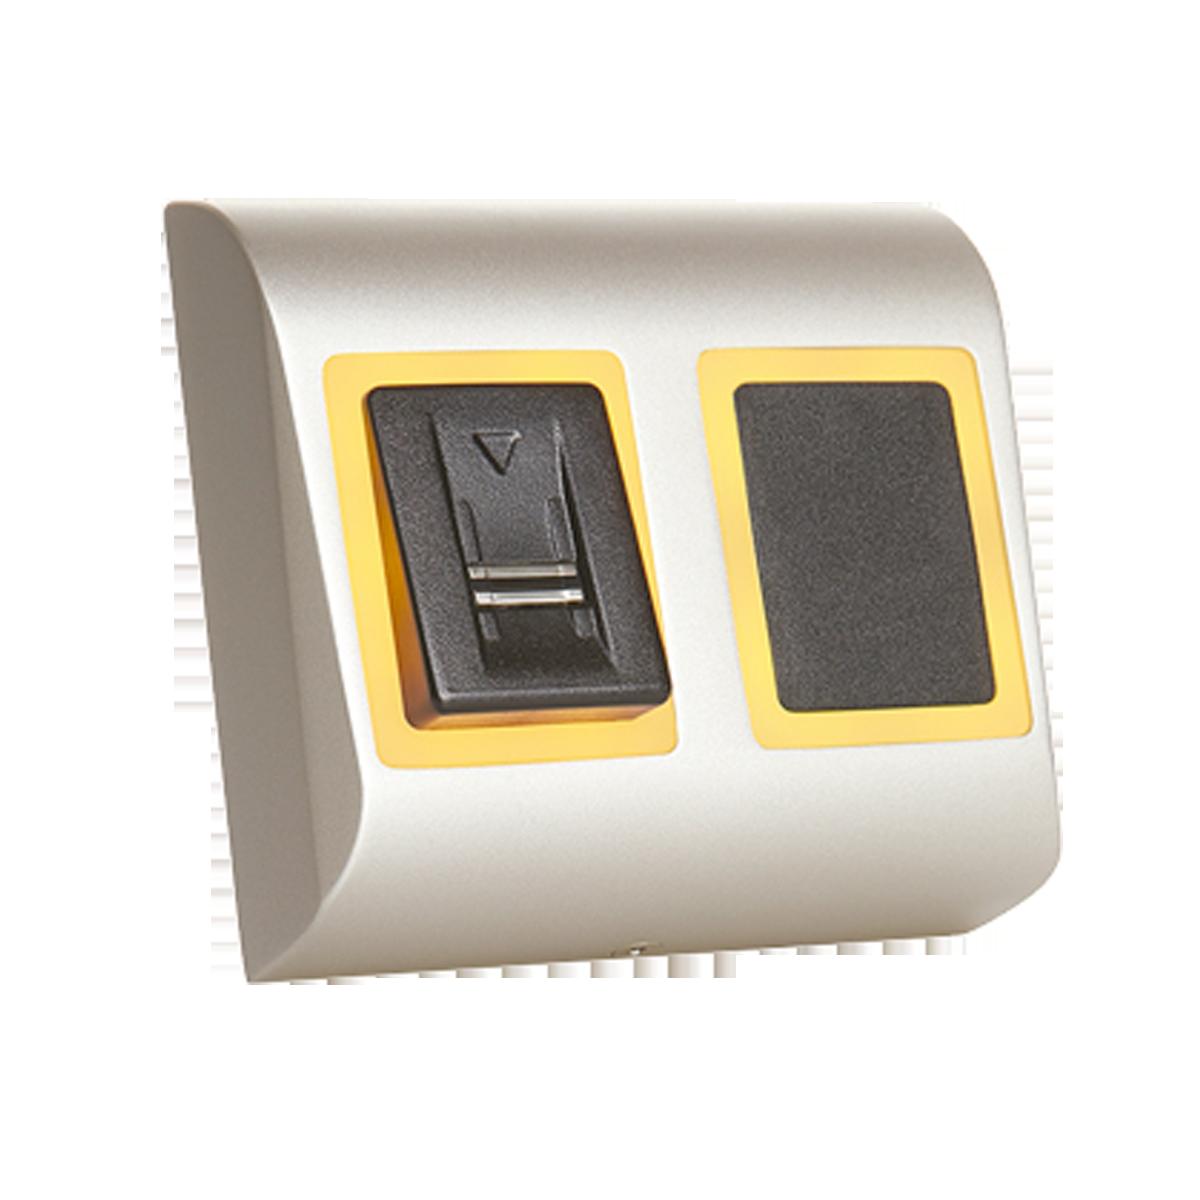 Leitor biométrico Swipe + leitor de Prox.